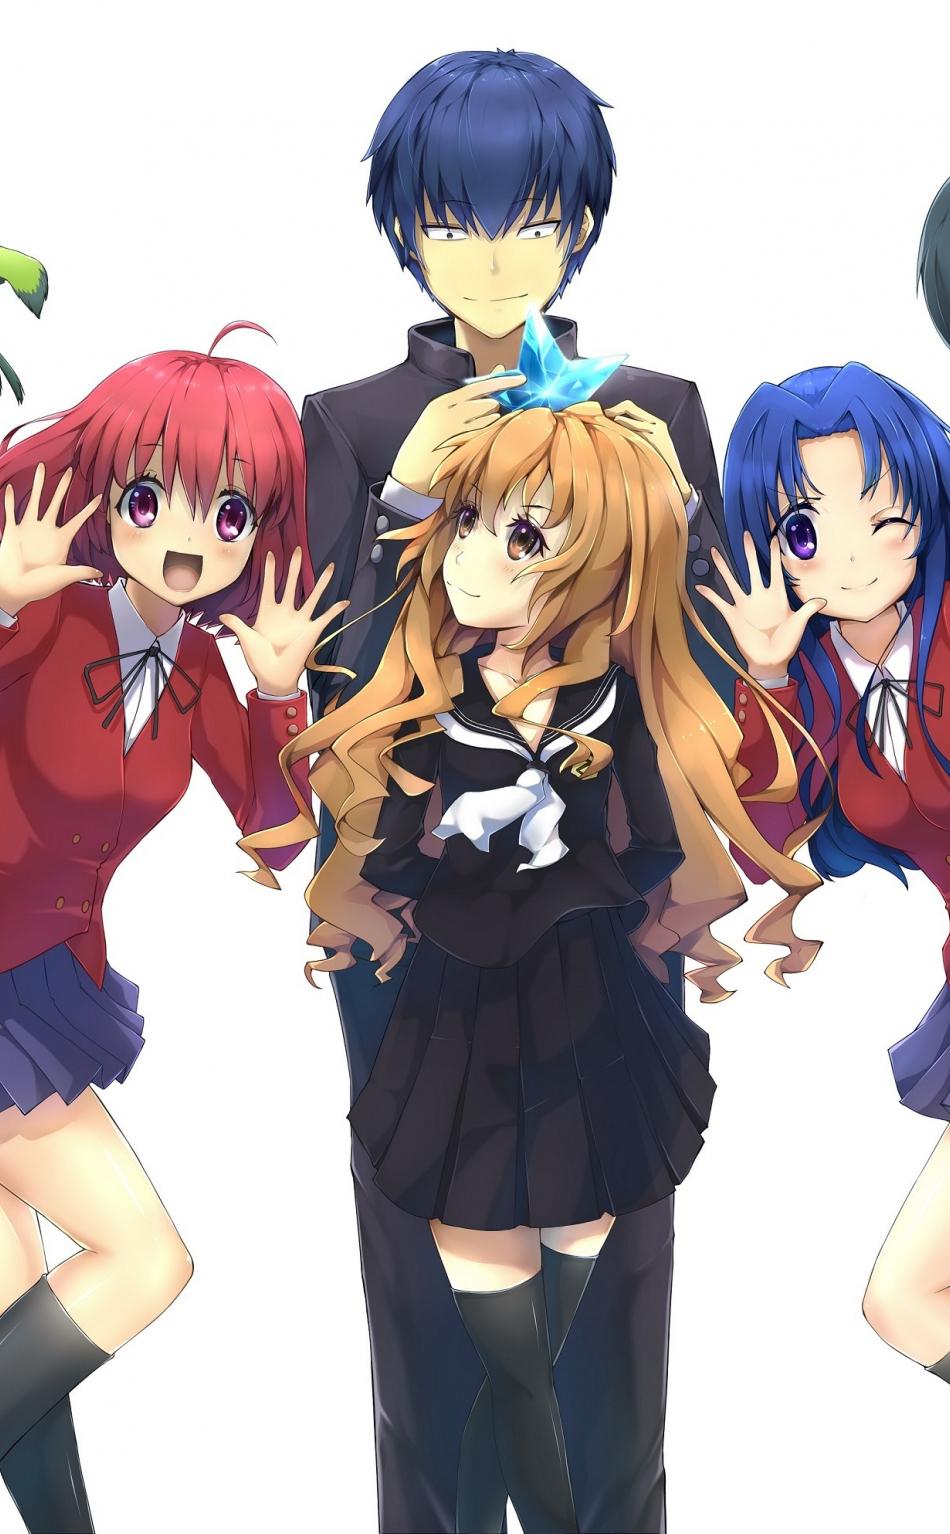 Download 950x1534 wallpaper toradora anime characters - Toradora anime wallpaper ...